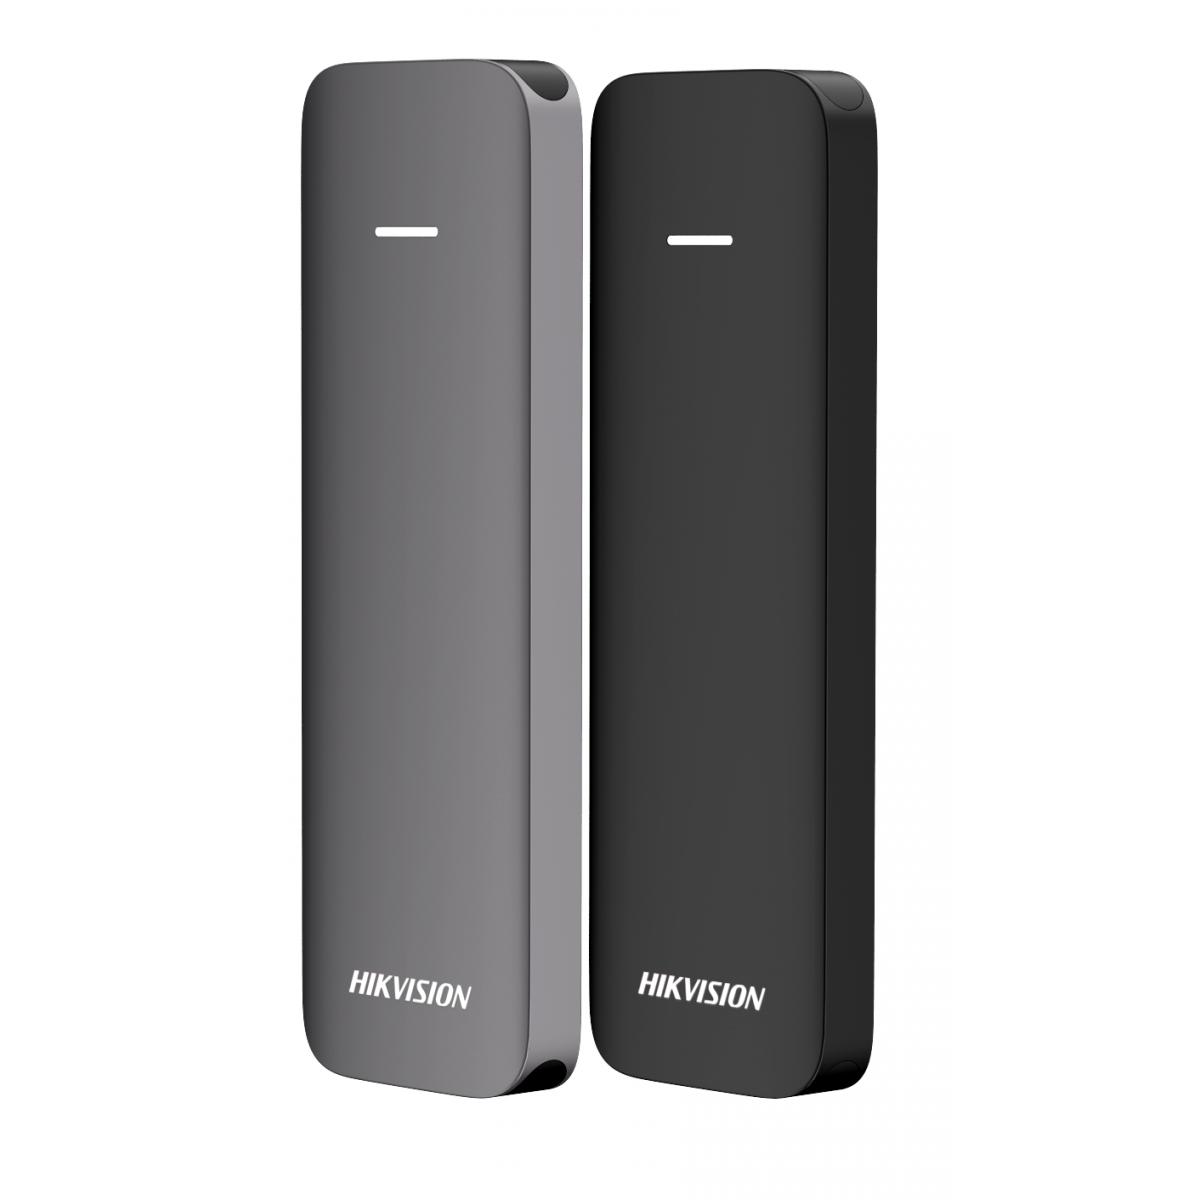 SSD Externo Portátil Hikvision Wind, 256GB, USB 3.1, Black, HS-P0256BWD